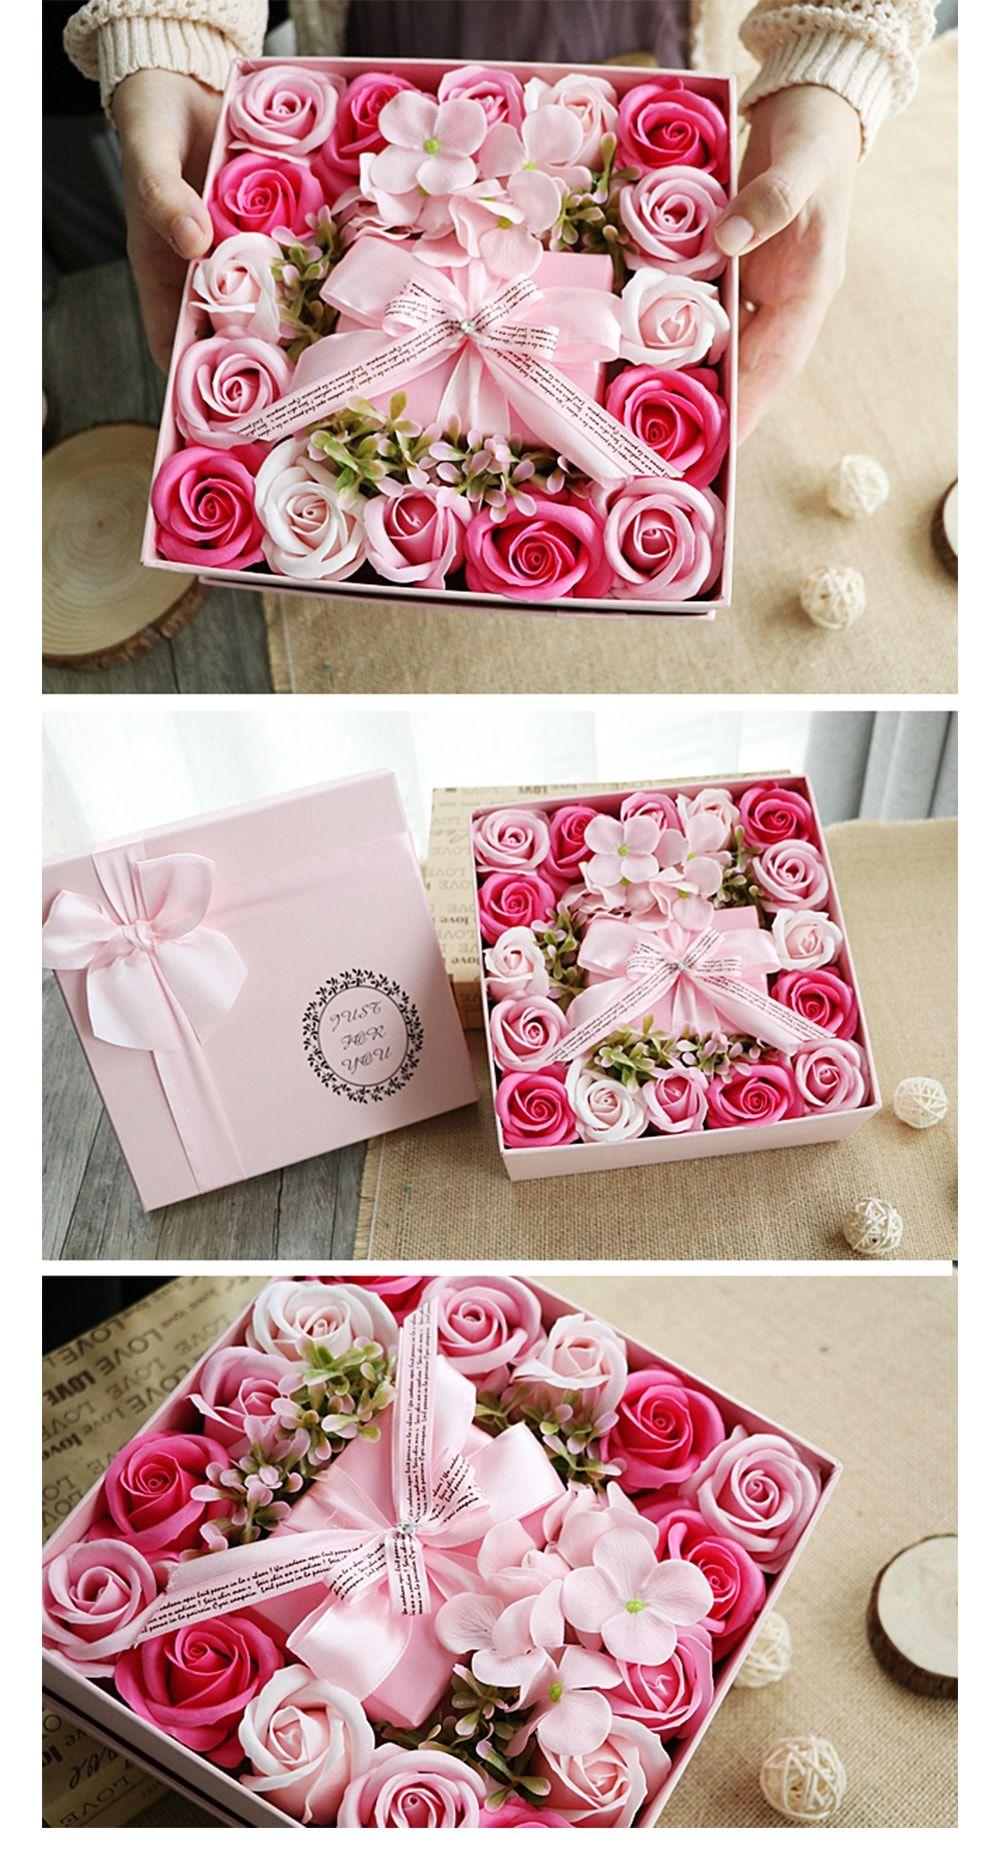 Rose Soap Petals Gift Set Flower box gift, Gifts, Pink